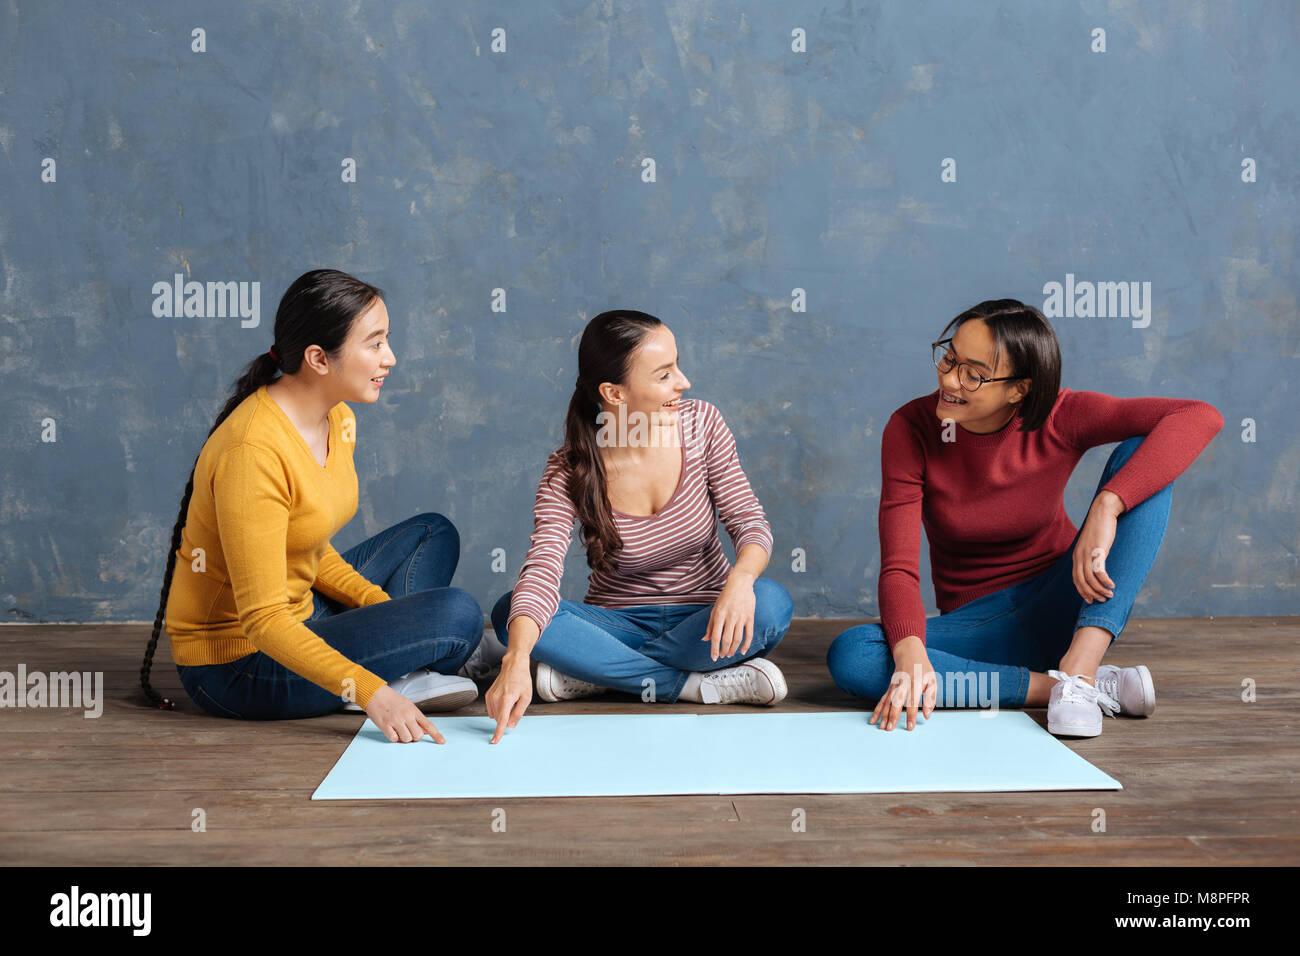 Cheerful happy women sitting on the floor - Stock Image